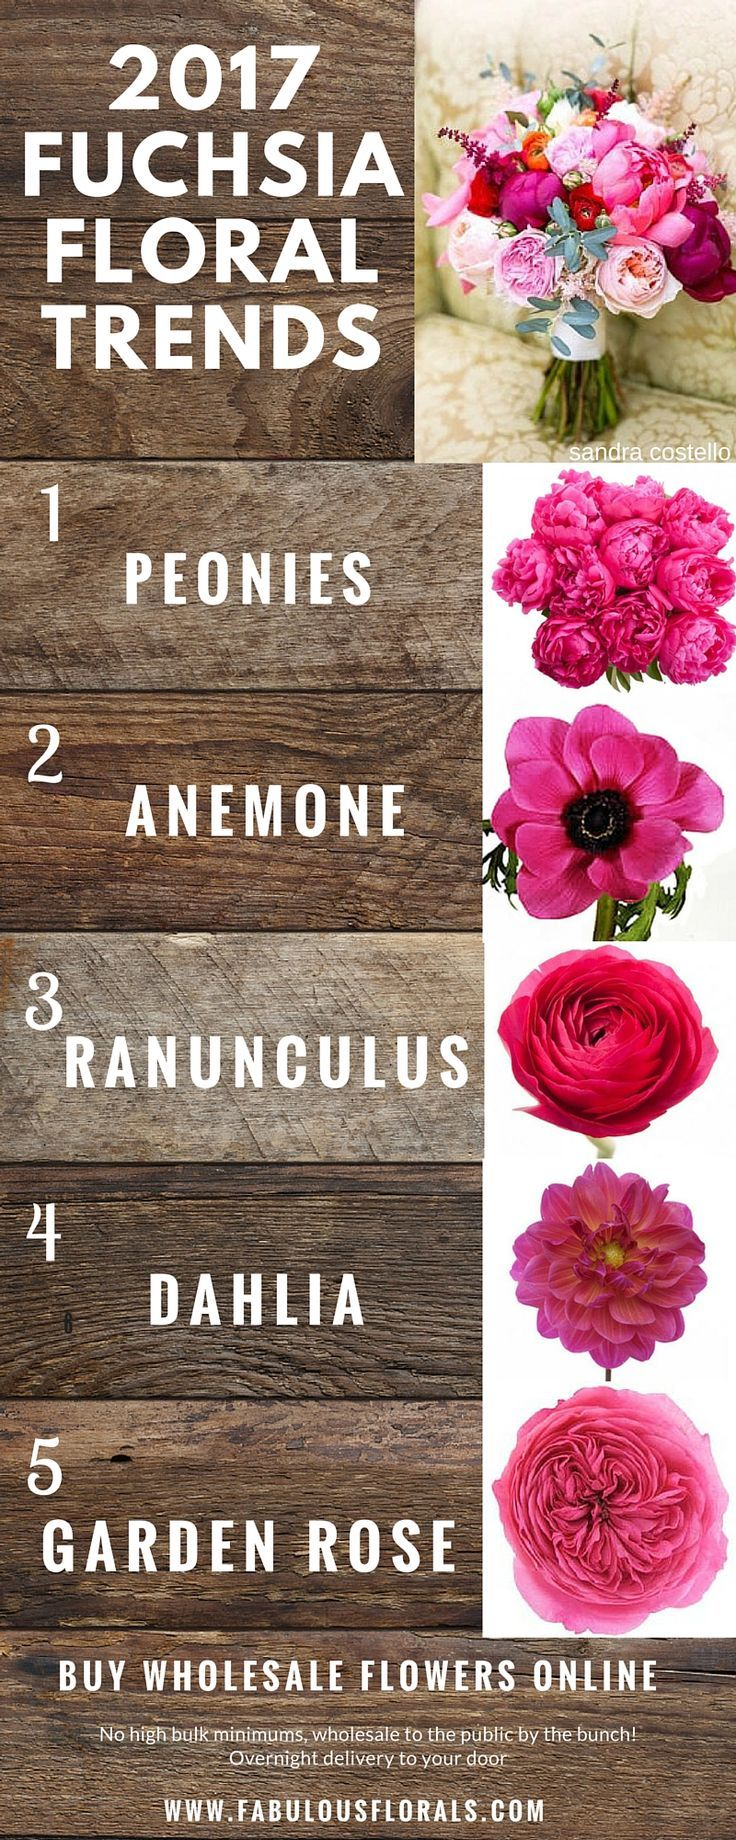 2017 fuchsia wedding flower trends!